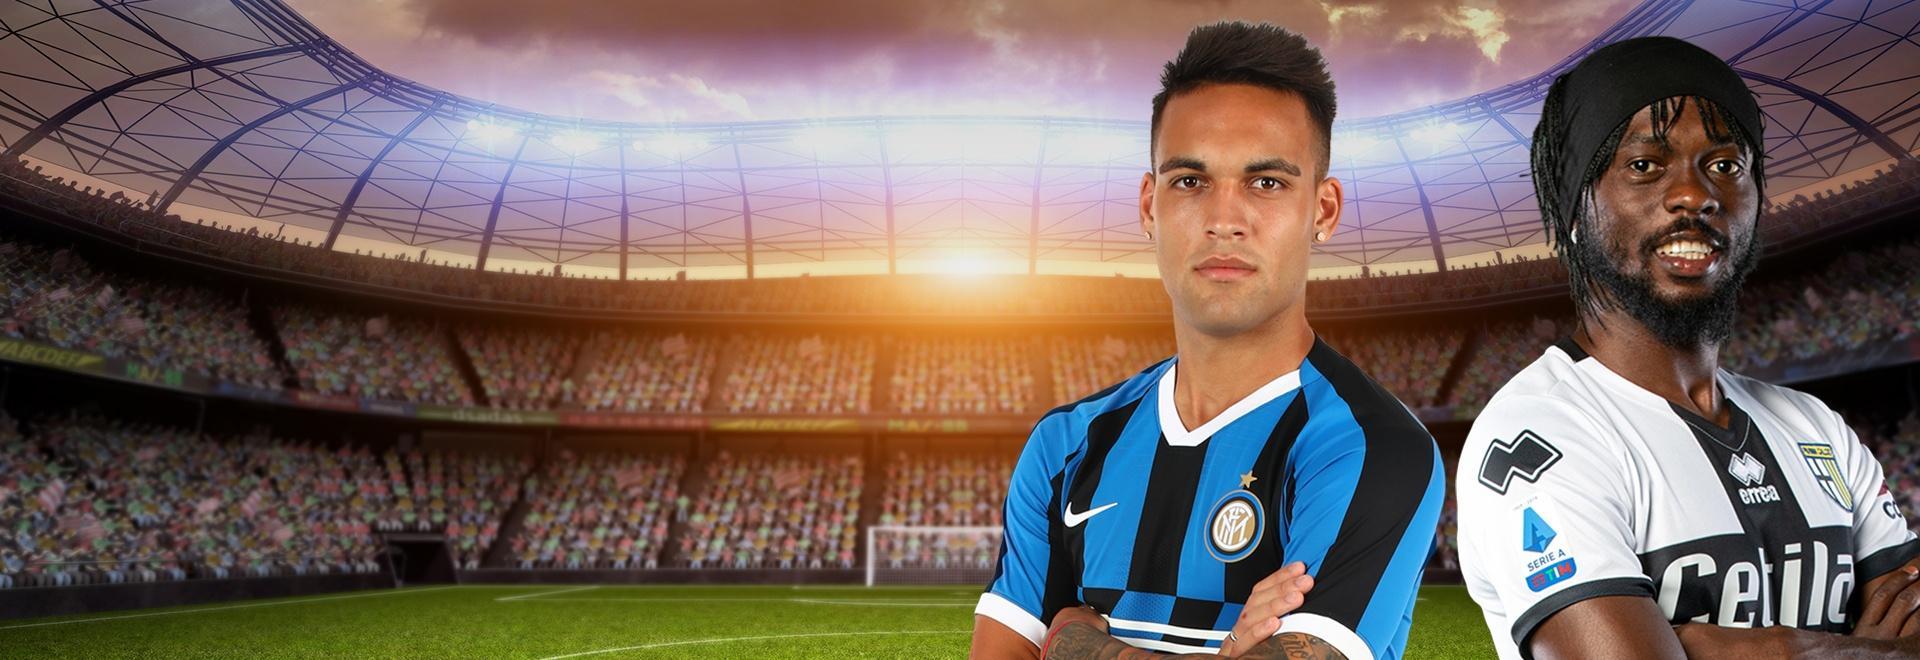 Inter - Parma. 9a g.